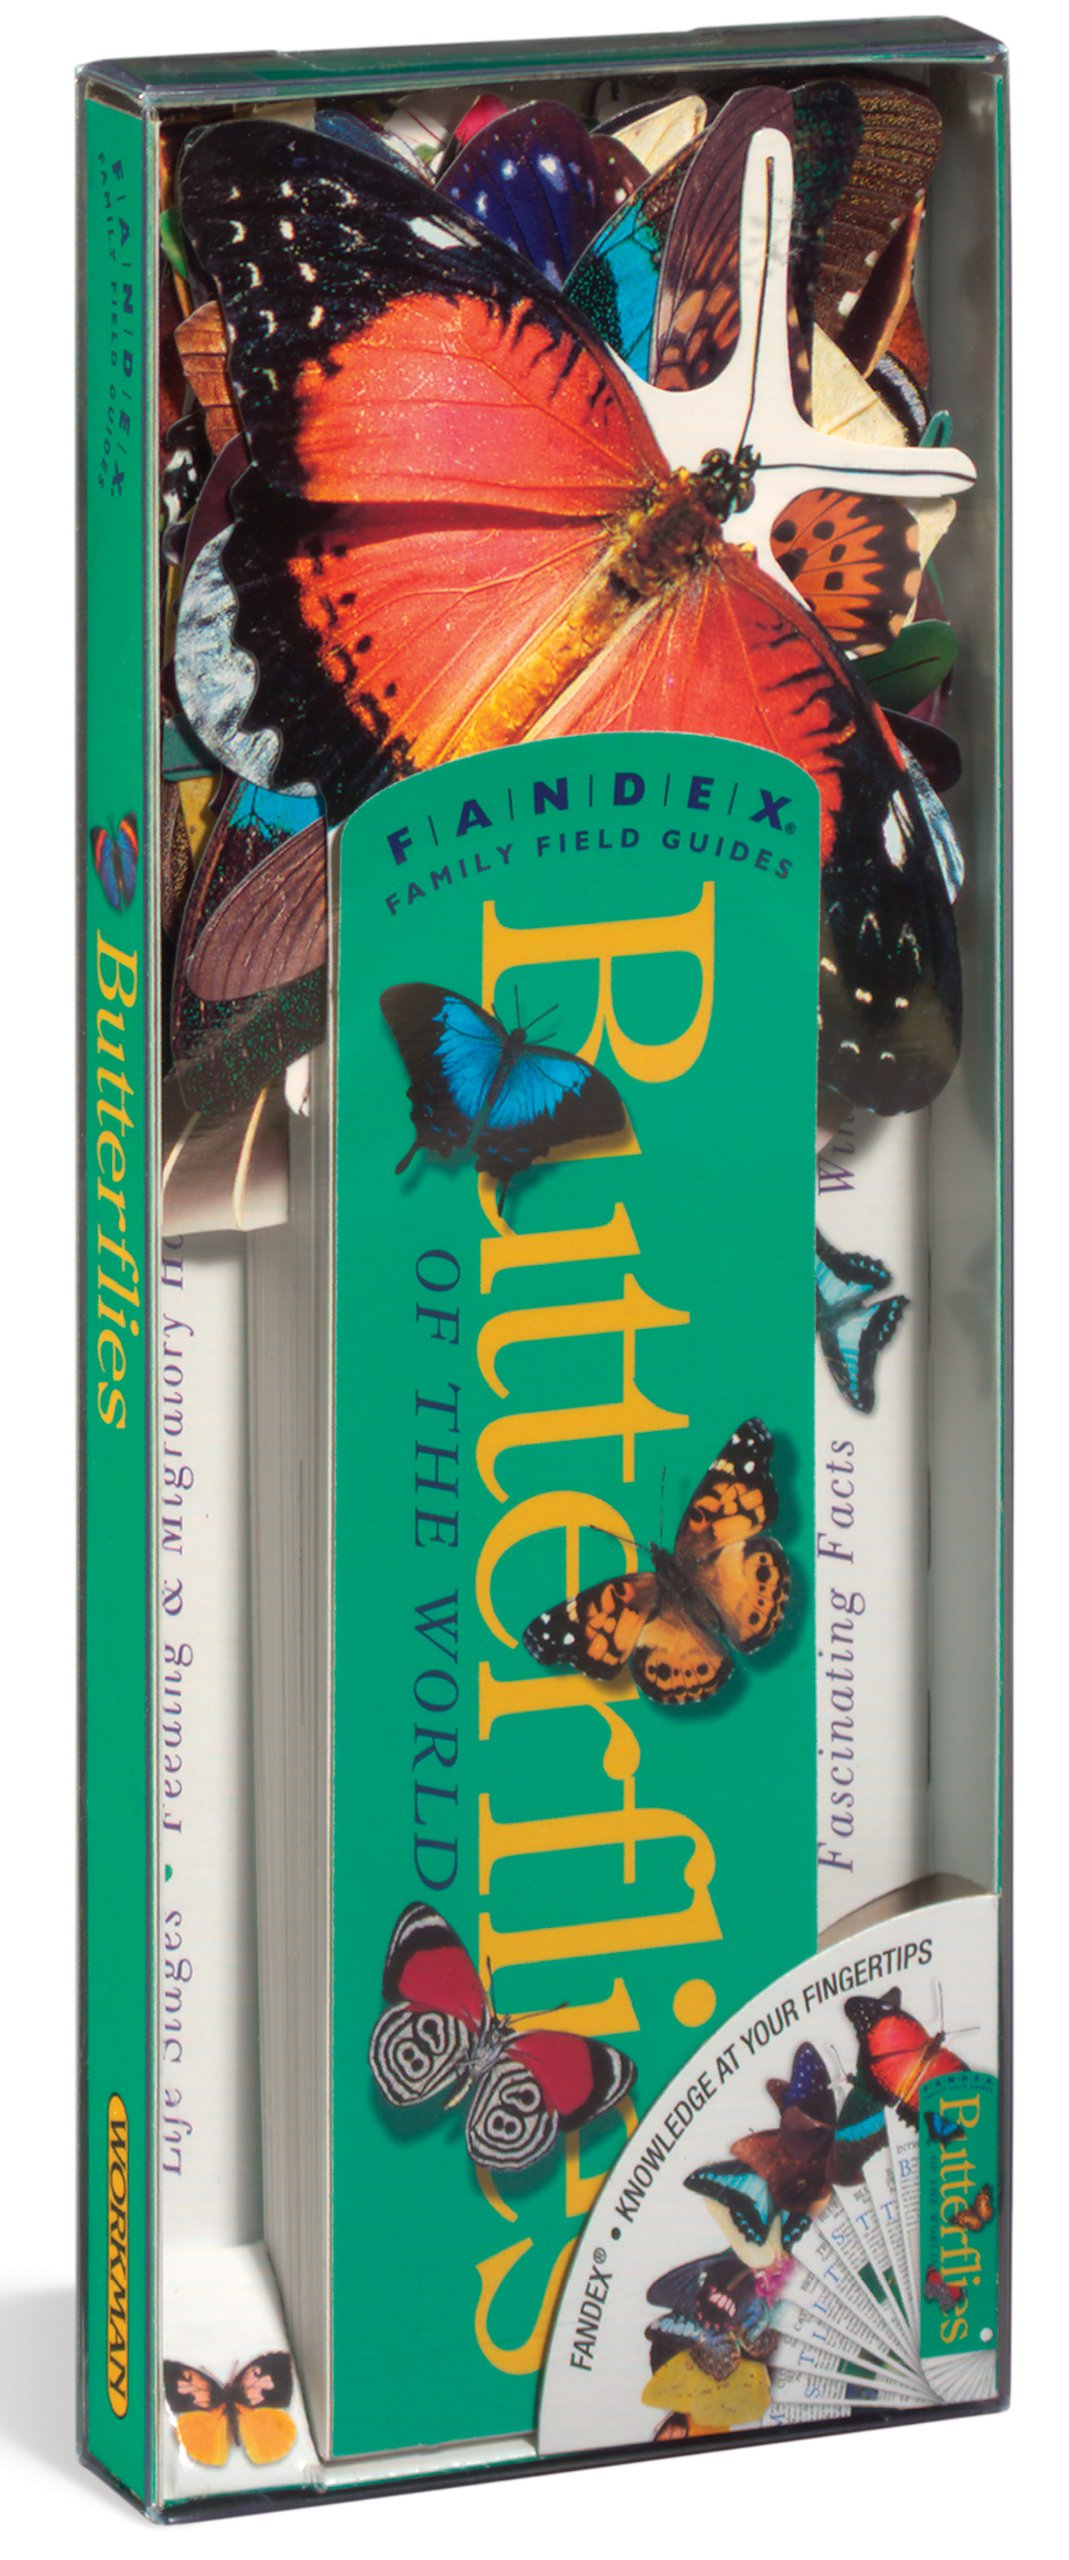 FANDEX Butterflies